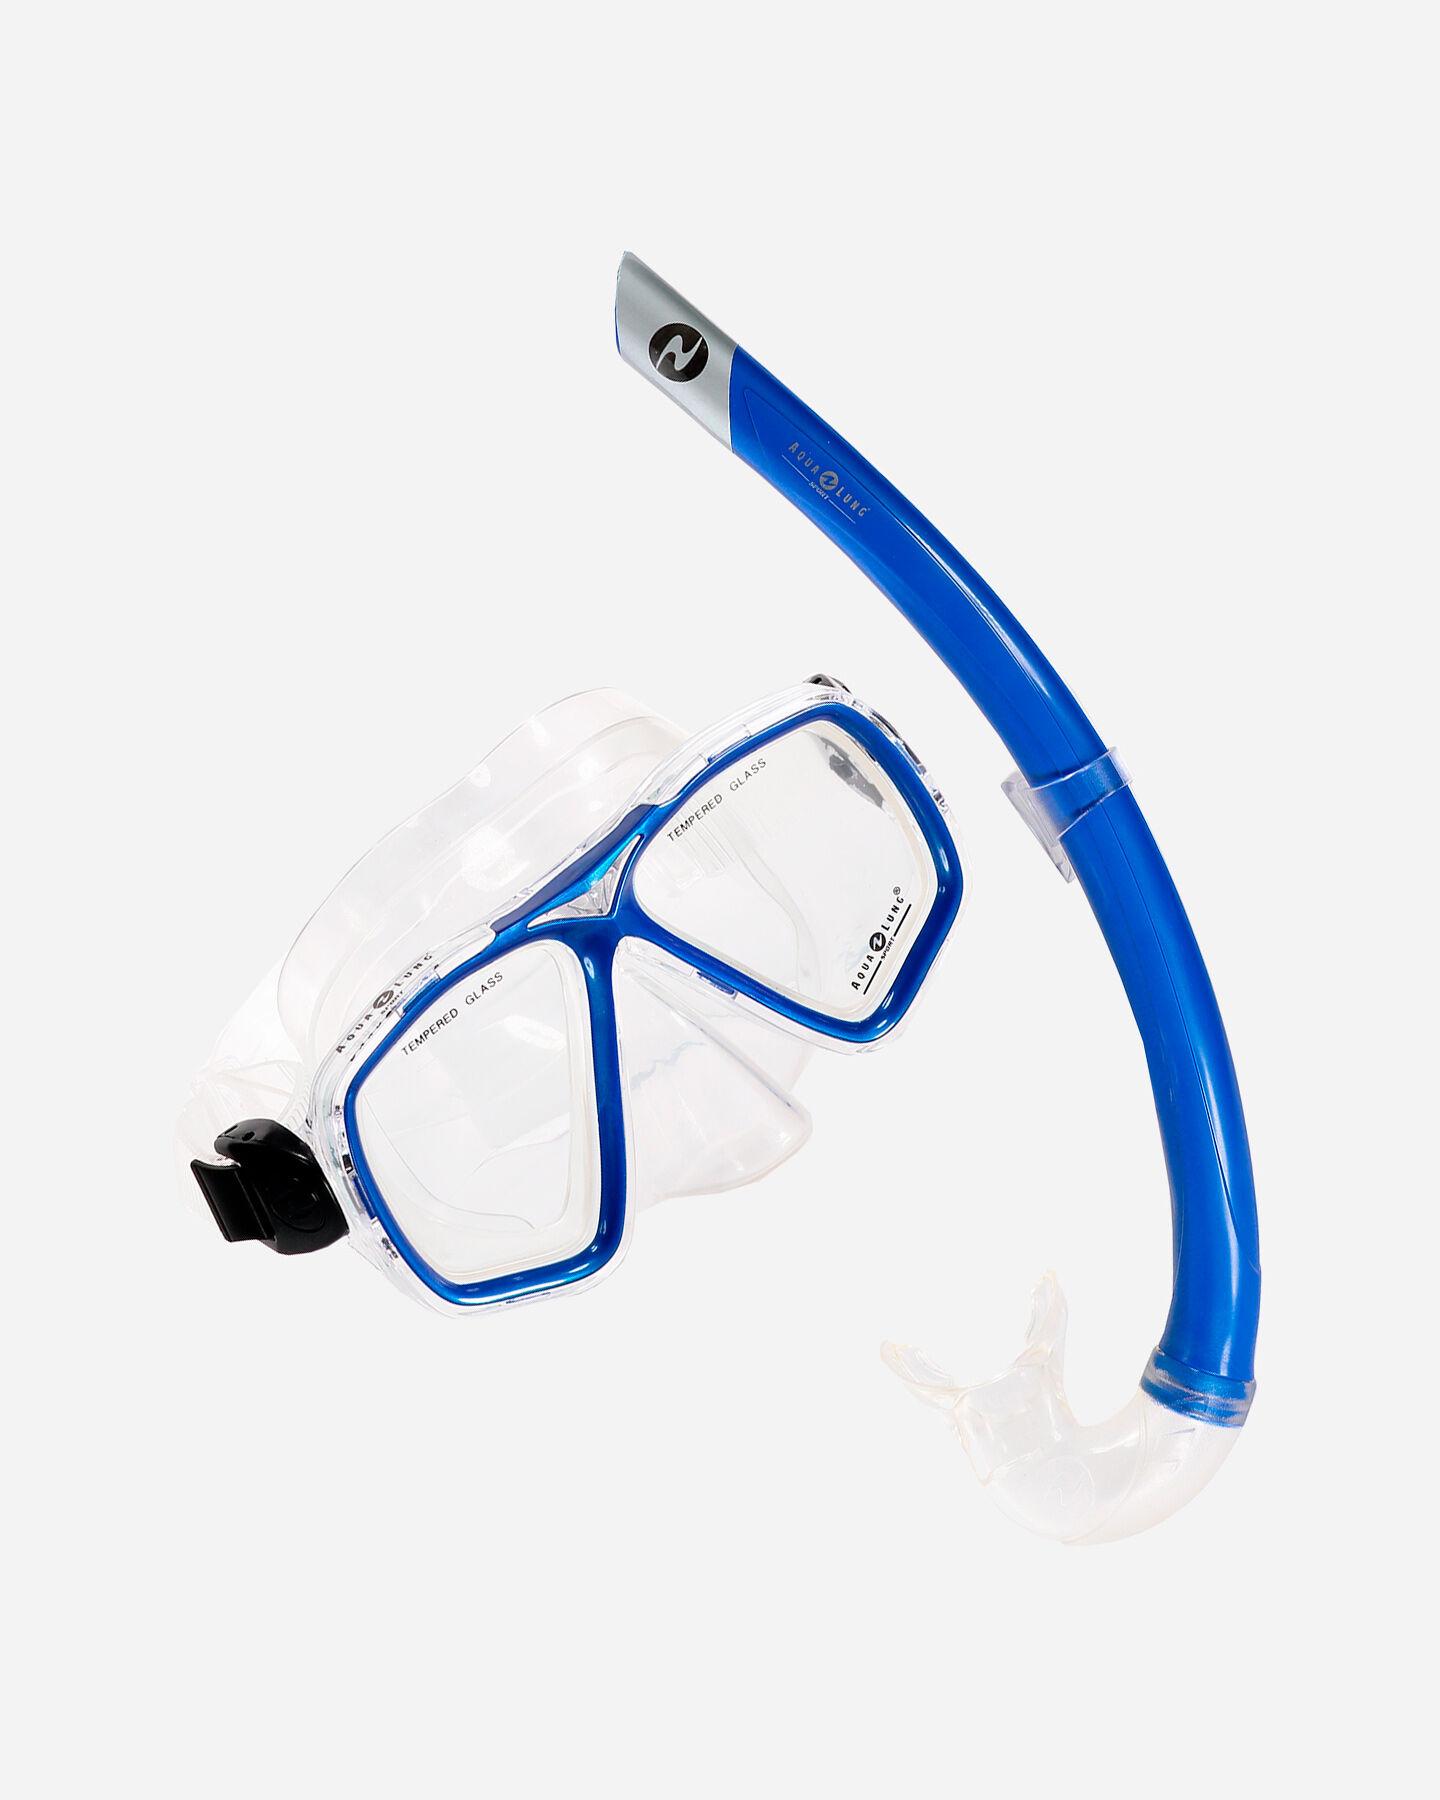 Kit snorkeling AQUALUNG SPORT ACAPULCO+BULA S1299382|660|UNI scatto 0